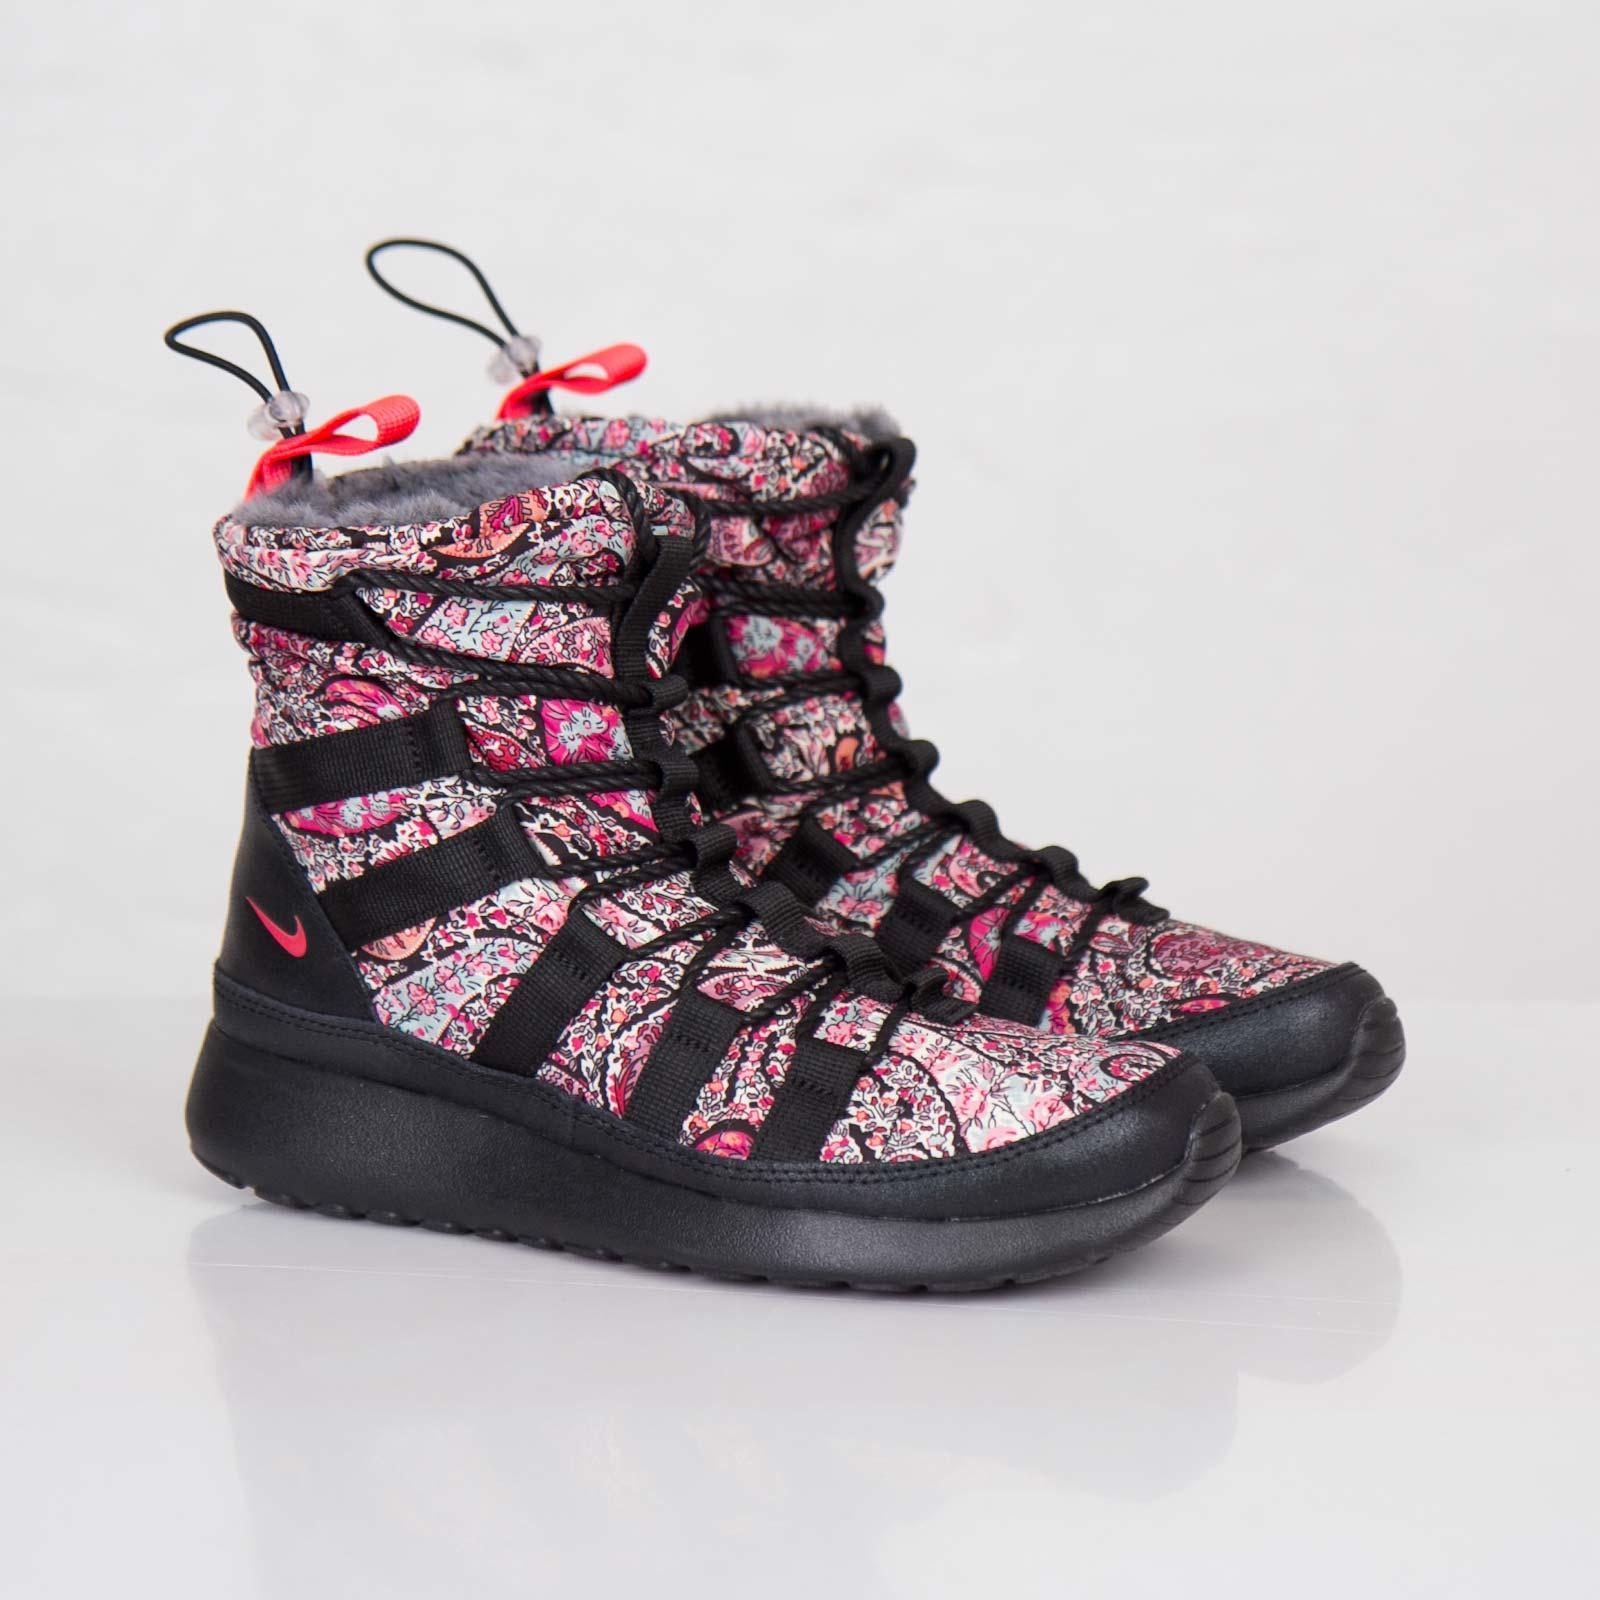 new products 335cf 69e1f Nike Wmns Roshe Run Hi Sneakerboot Liberty QS